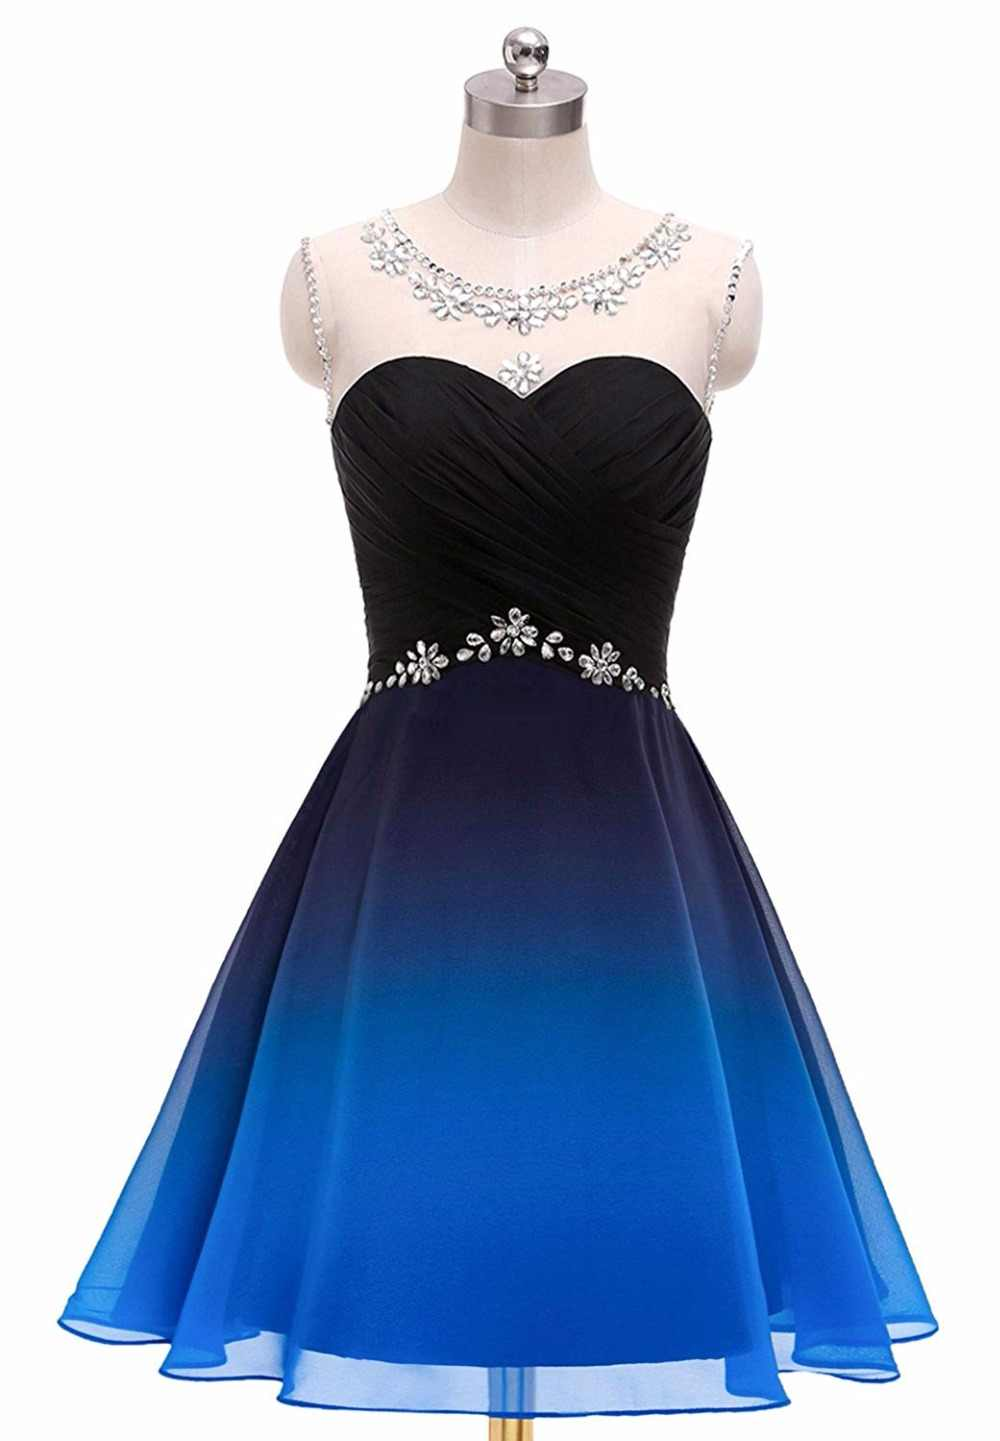 Bealegantom 2019 Gradient Chiffon Short Prom Dresses Ombre Beads Evening  Party Gowns Homecoming Graduation Dress QA1560 22e3b2e3d1ac